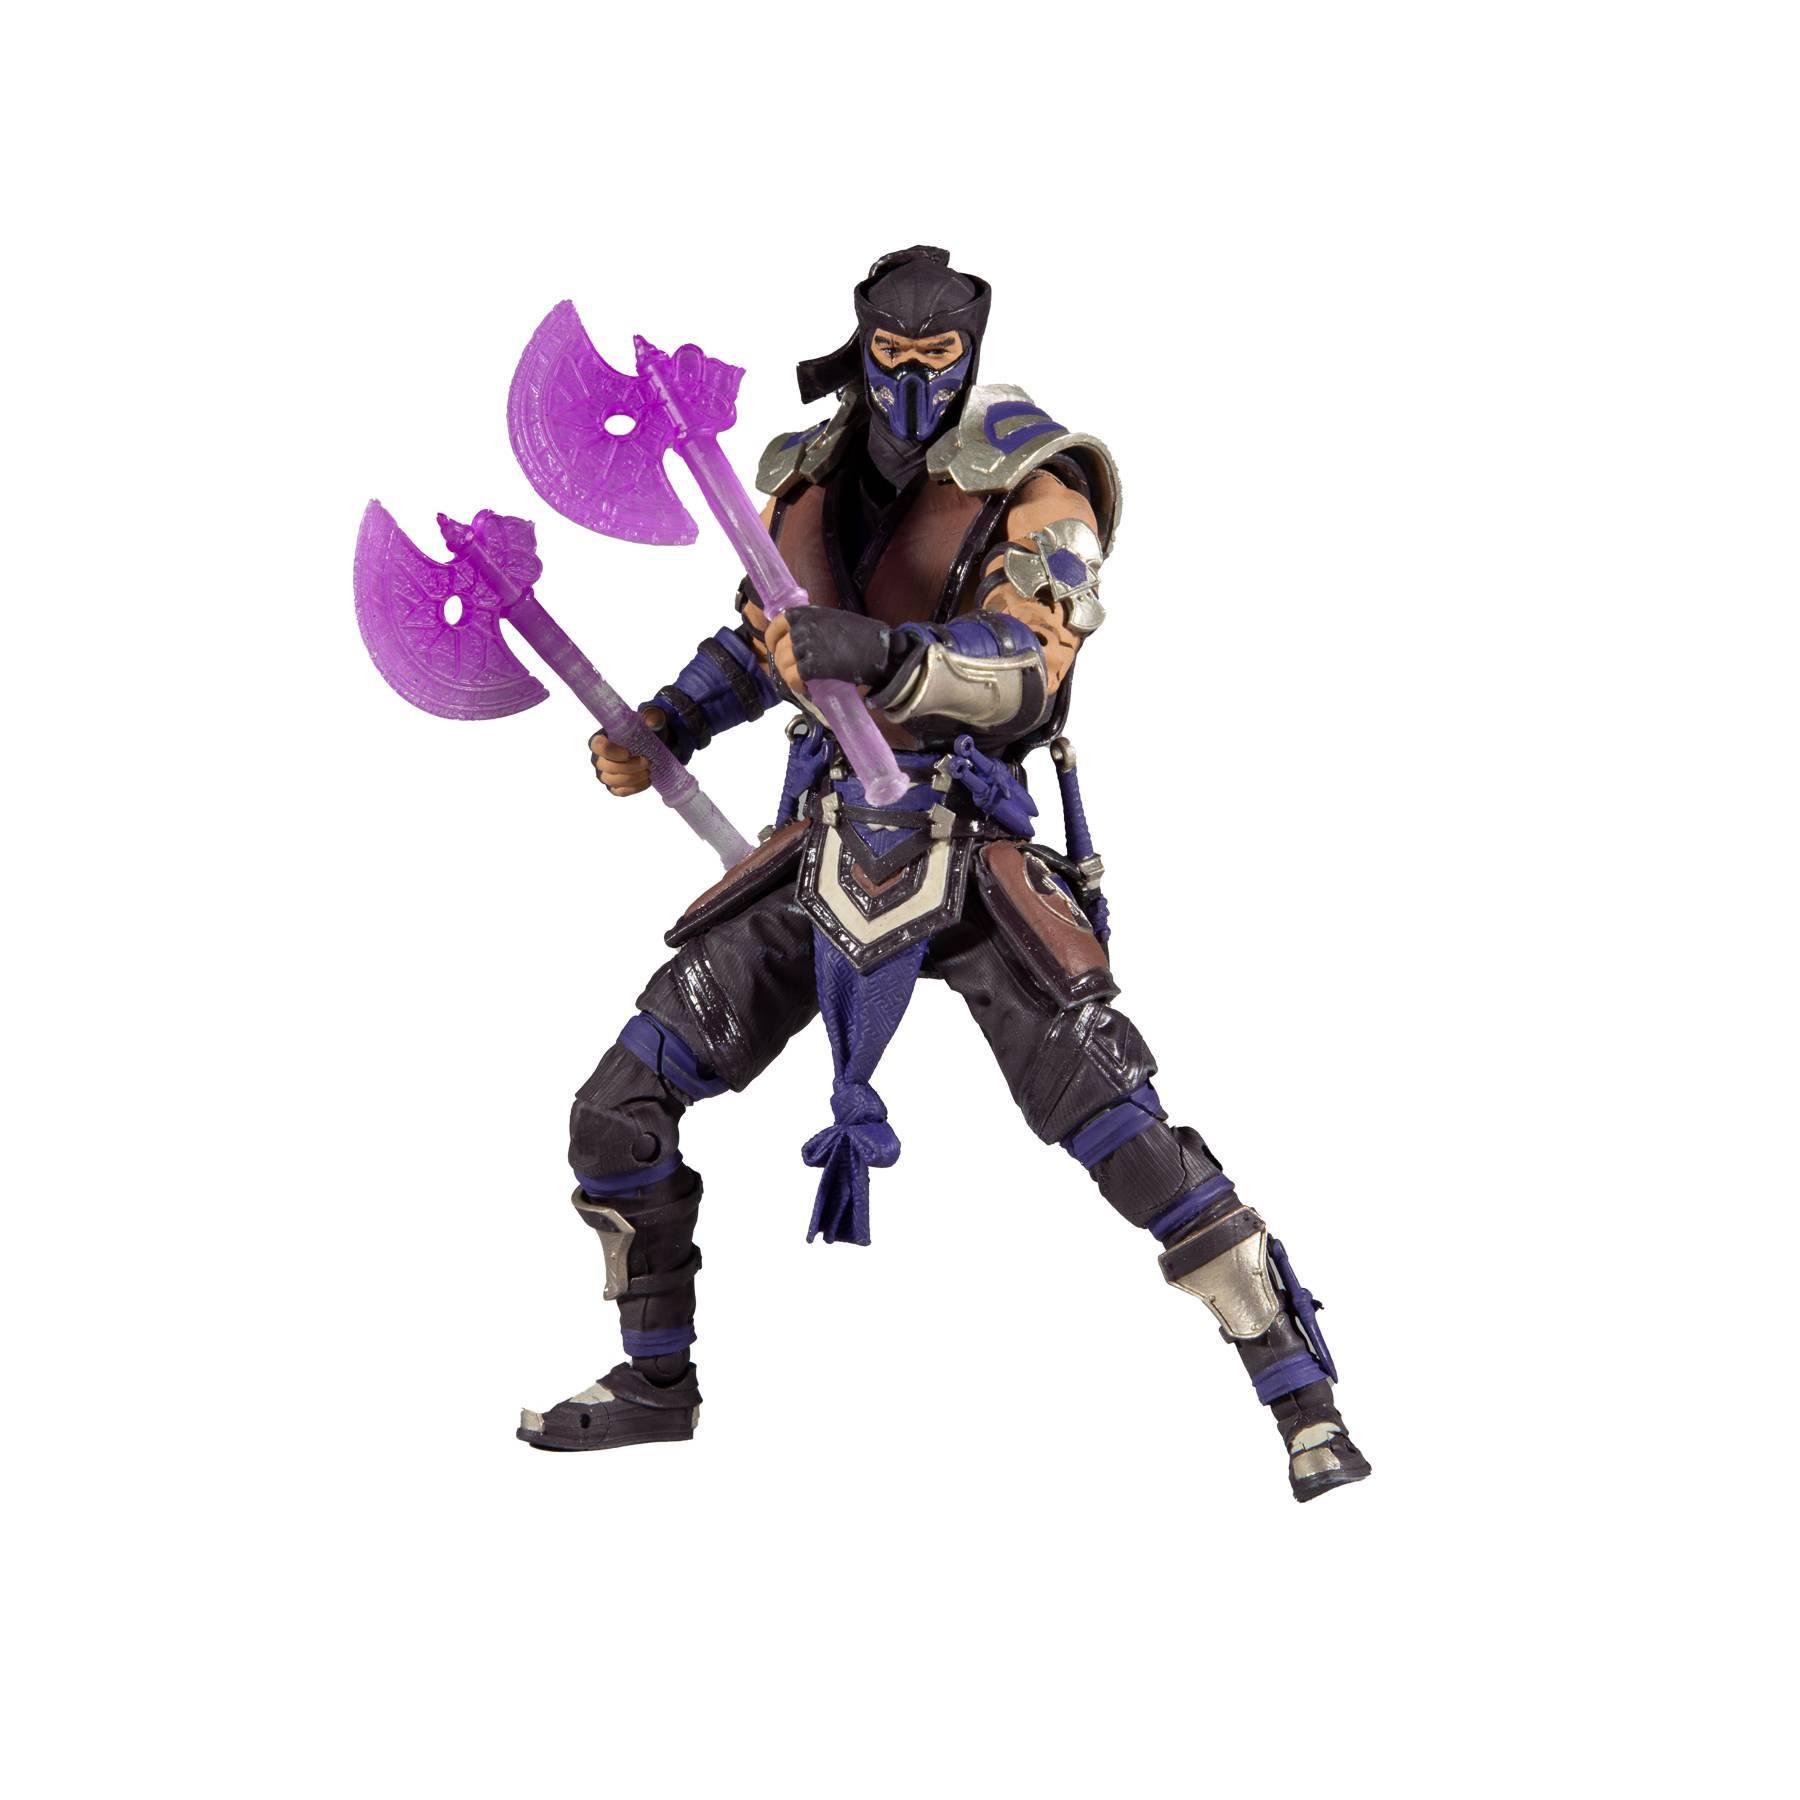 Mortal Kombat: SUB ZERO (Winter Purple Variant) by McFArlane Toys